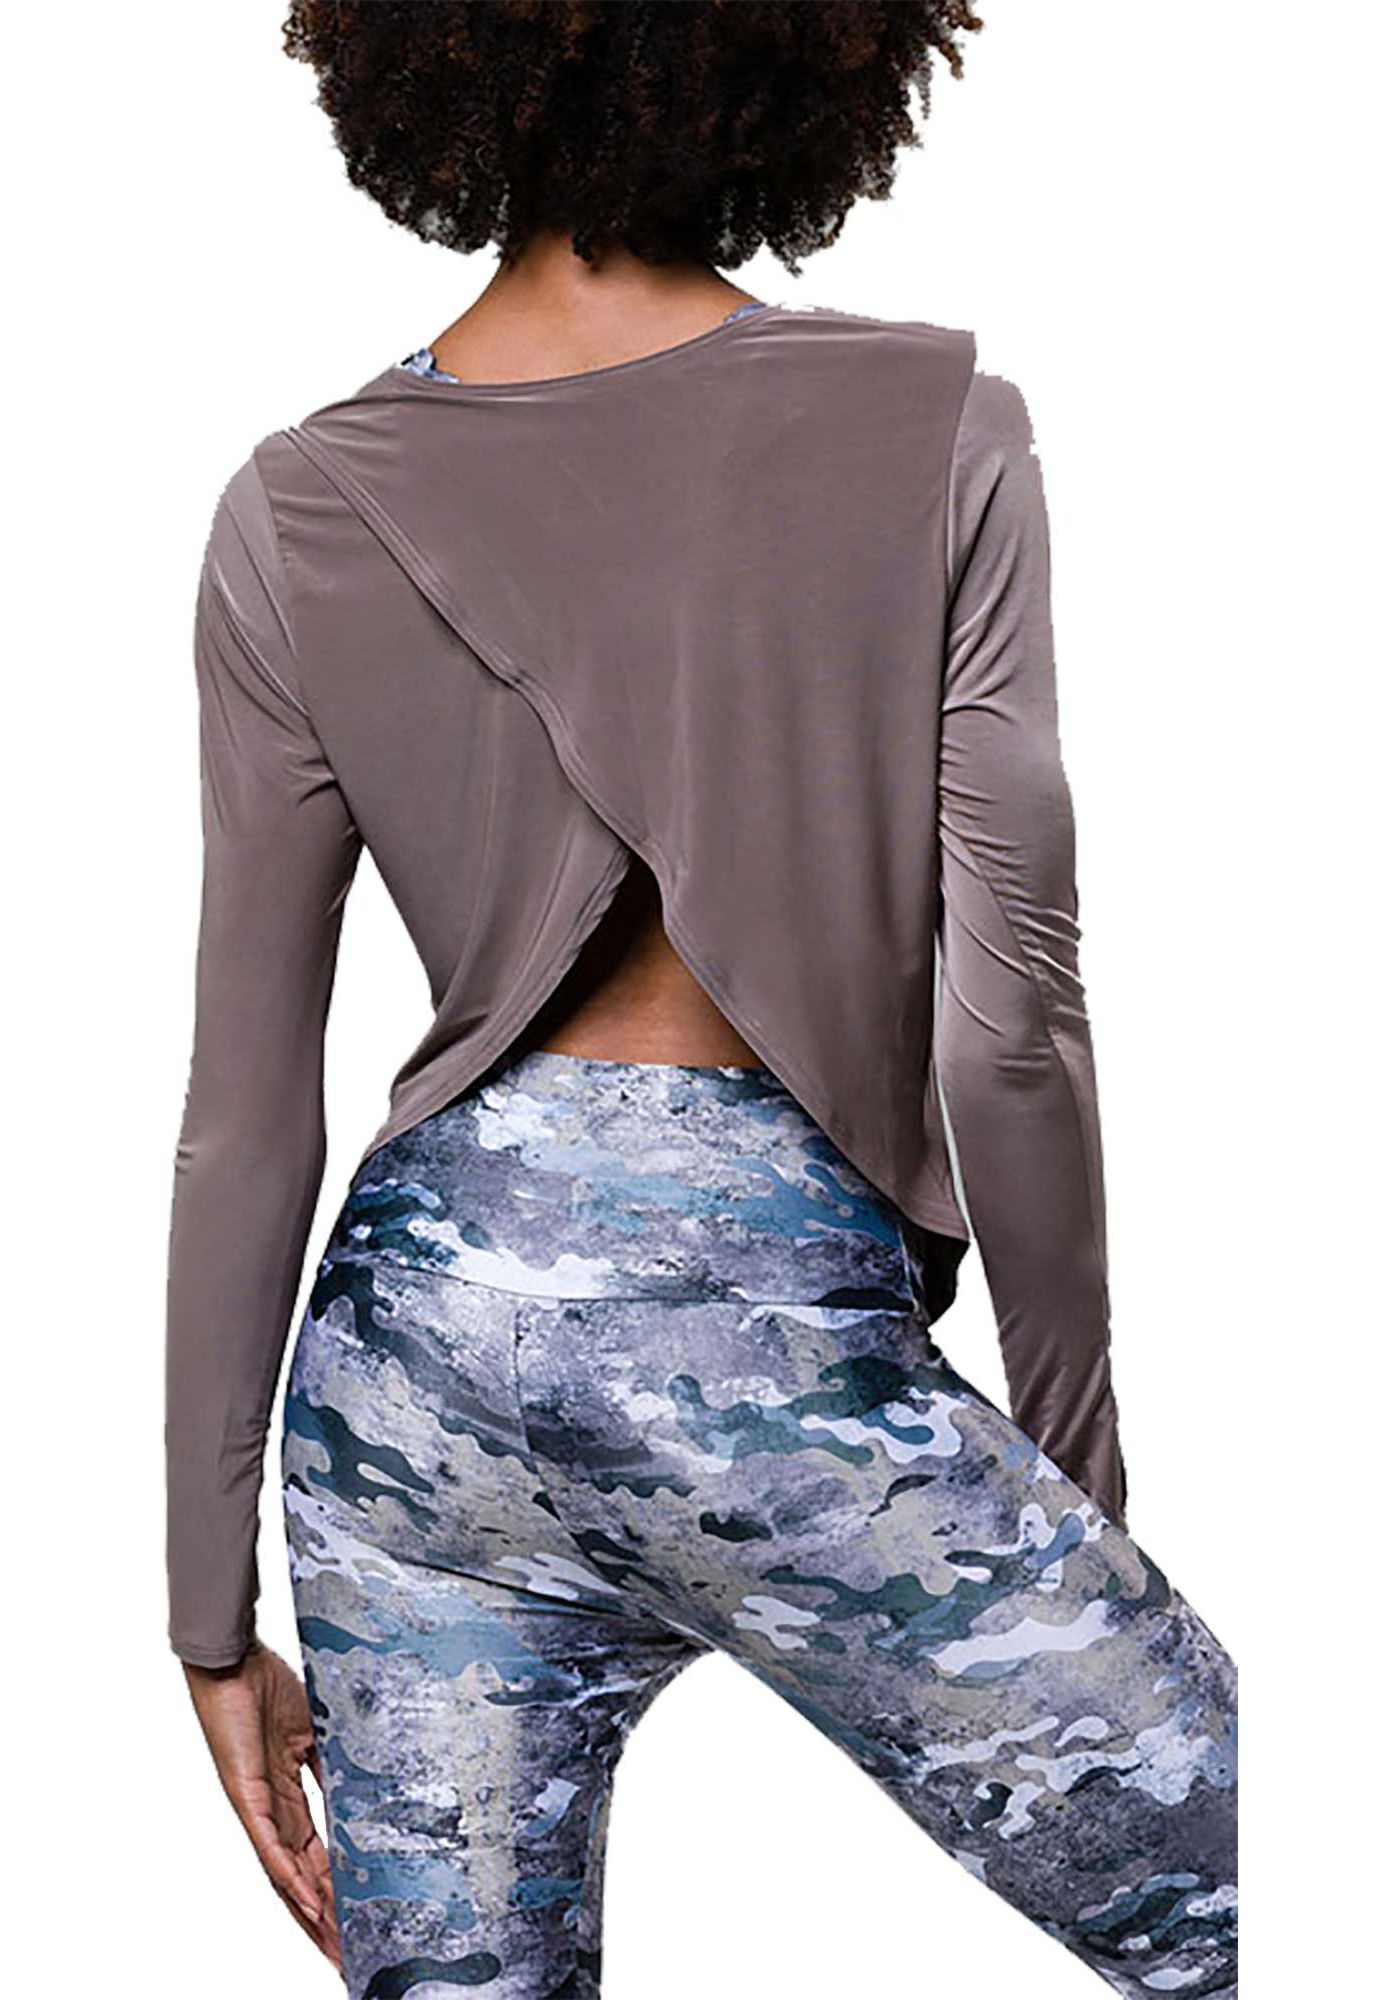 Onzie Women's Tulip Back Long Sleeve Shirt